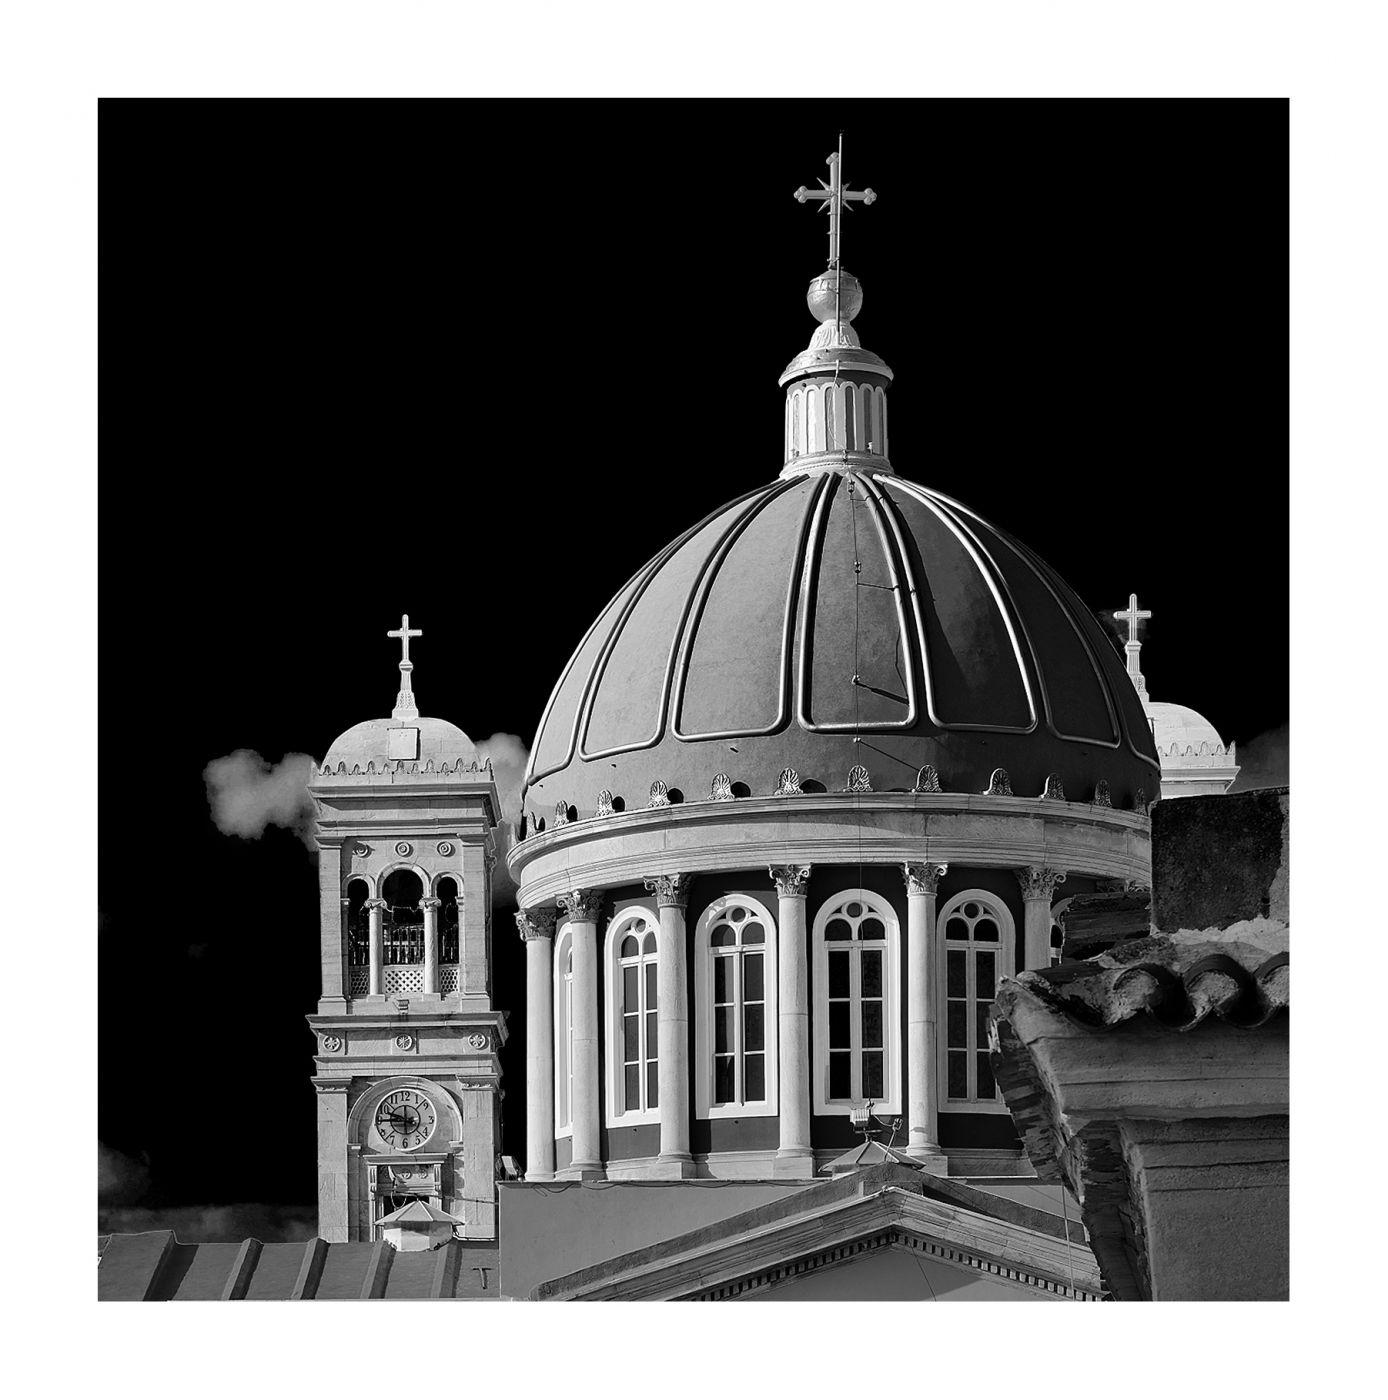 The Dome of Saint Nicholas Church, Syros, Greece